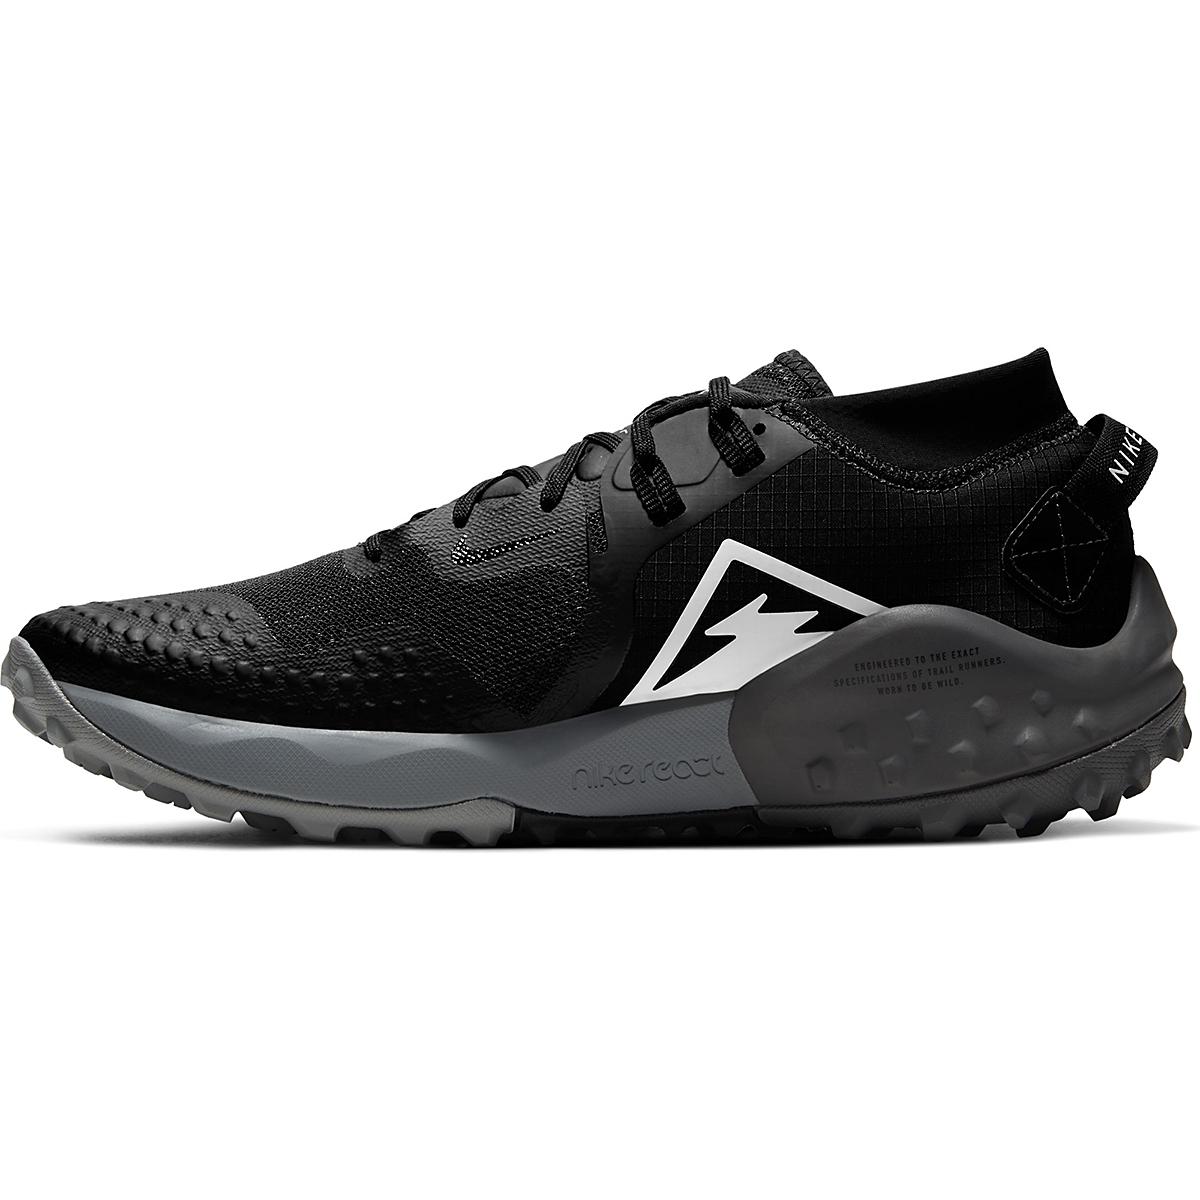 Men's Nike Wildhorse 6 Trail Running Shoe - Color: Off Noir/Spruce Aura-Black-Iron Grey - Size: 6 - Width: Regular, Off Noir/Spruce Aura-Black-Iron Grey, large, image 2